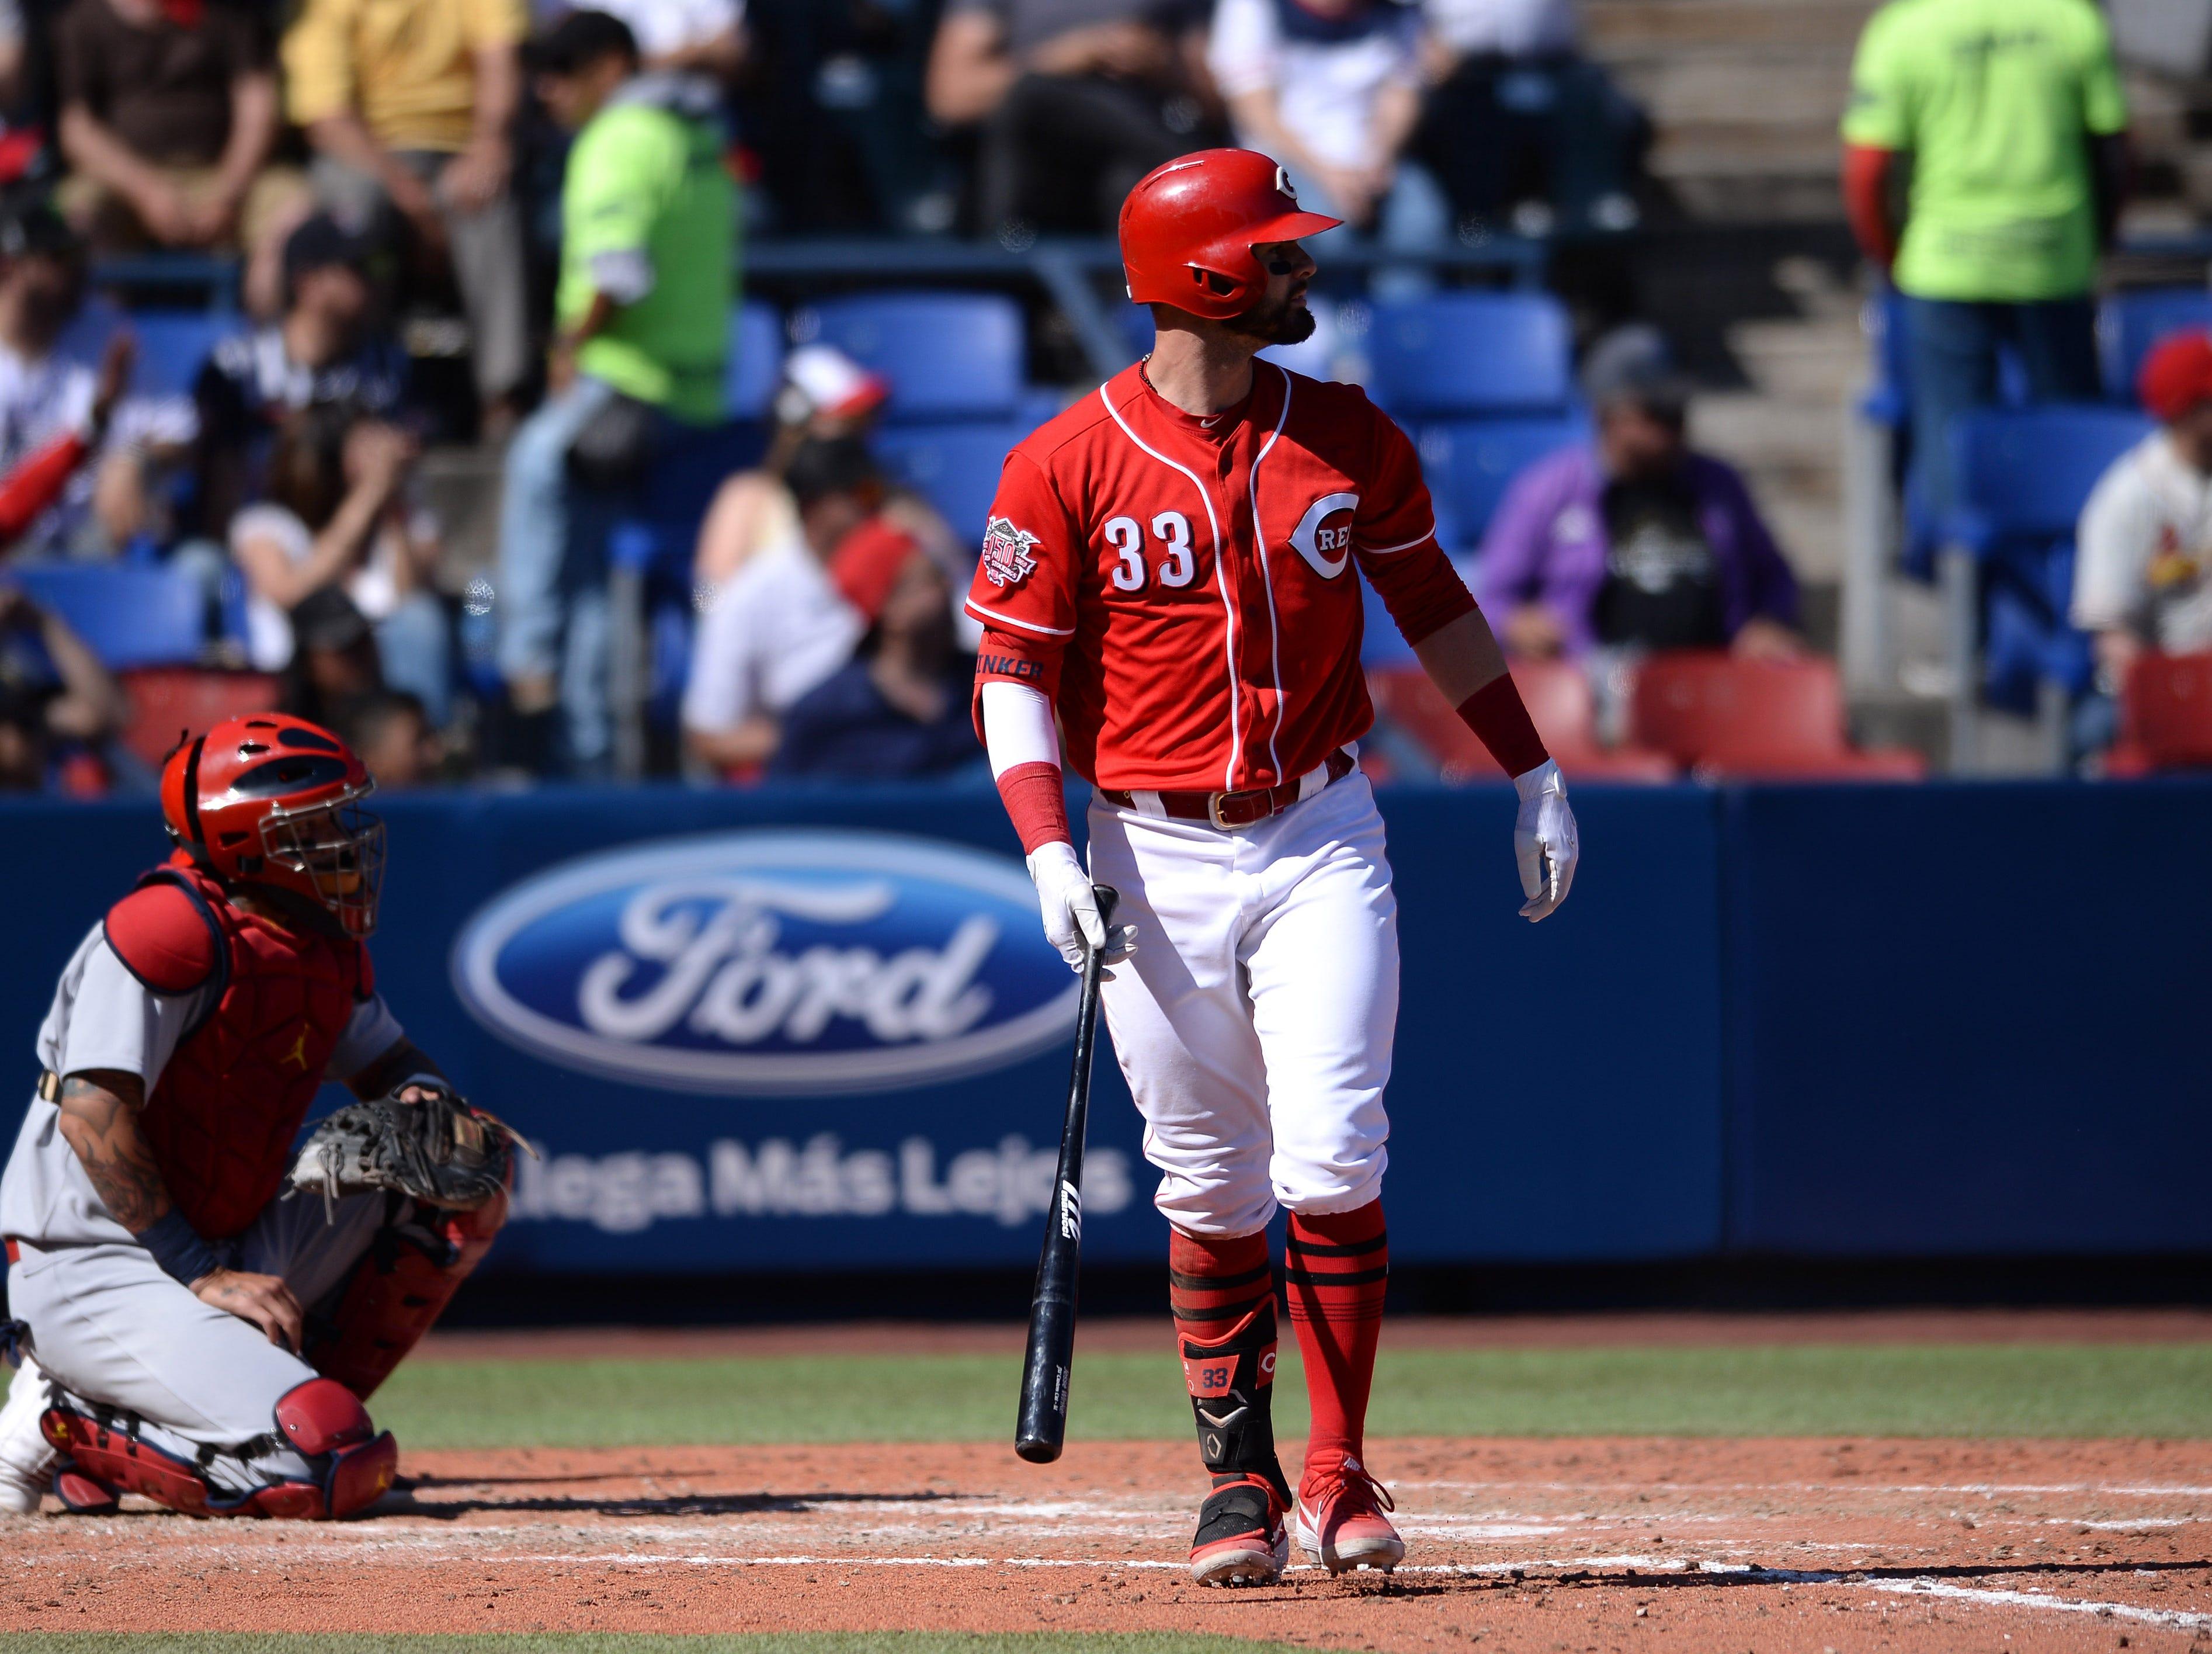 Cincinnati Reds left fielder Jesse Winker (33) hits a three run home run against the St. Louis Cardinals during the fifth inning at Estadio de Beisbol Monterrey.